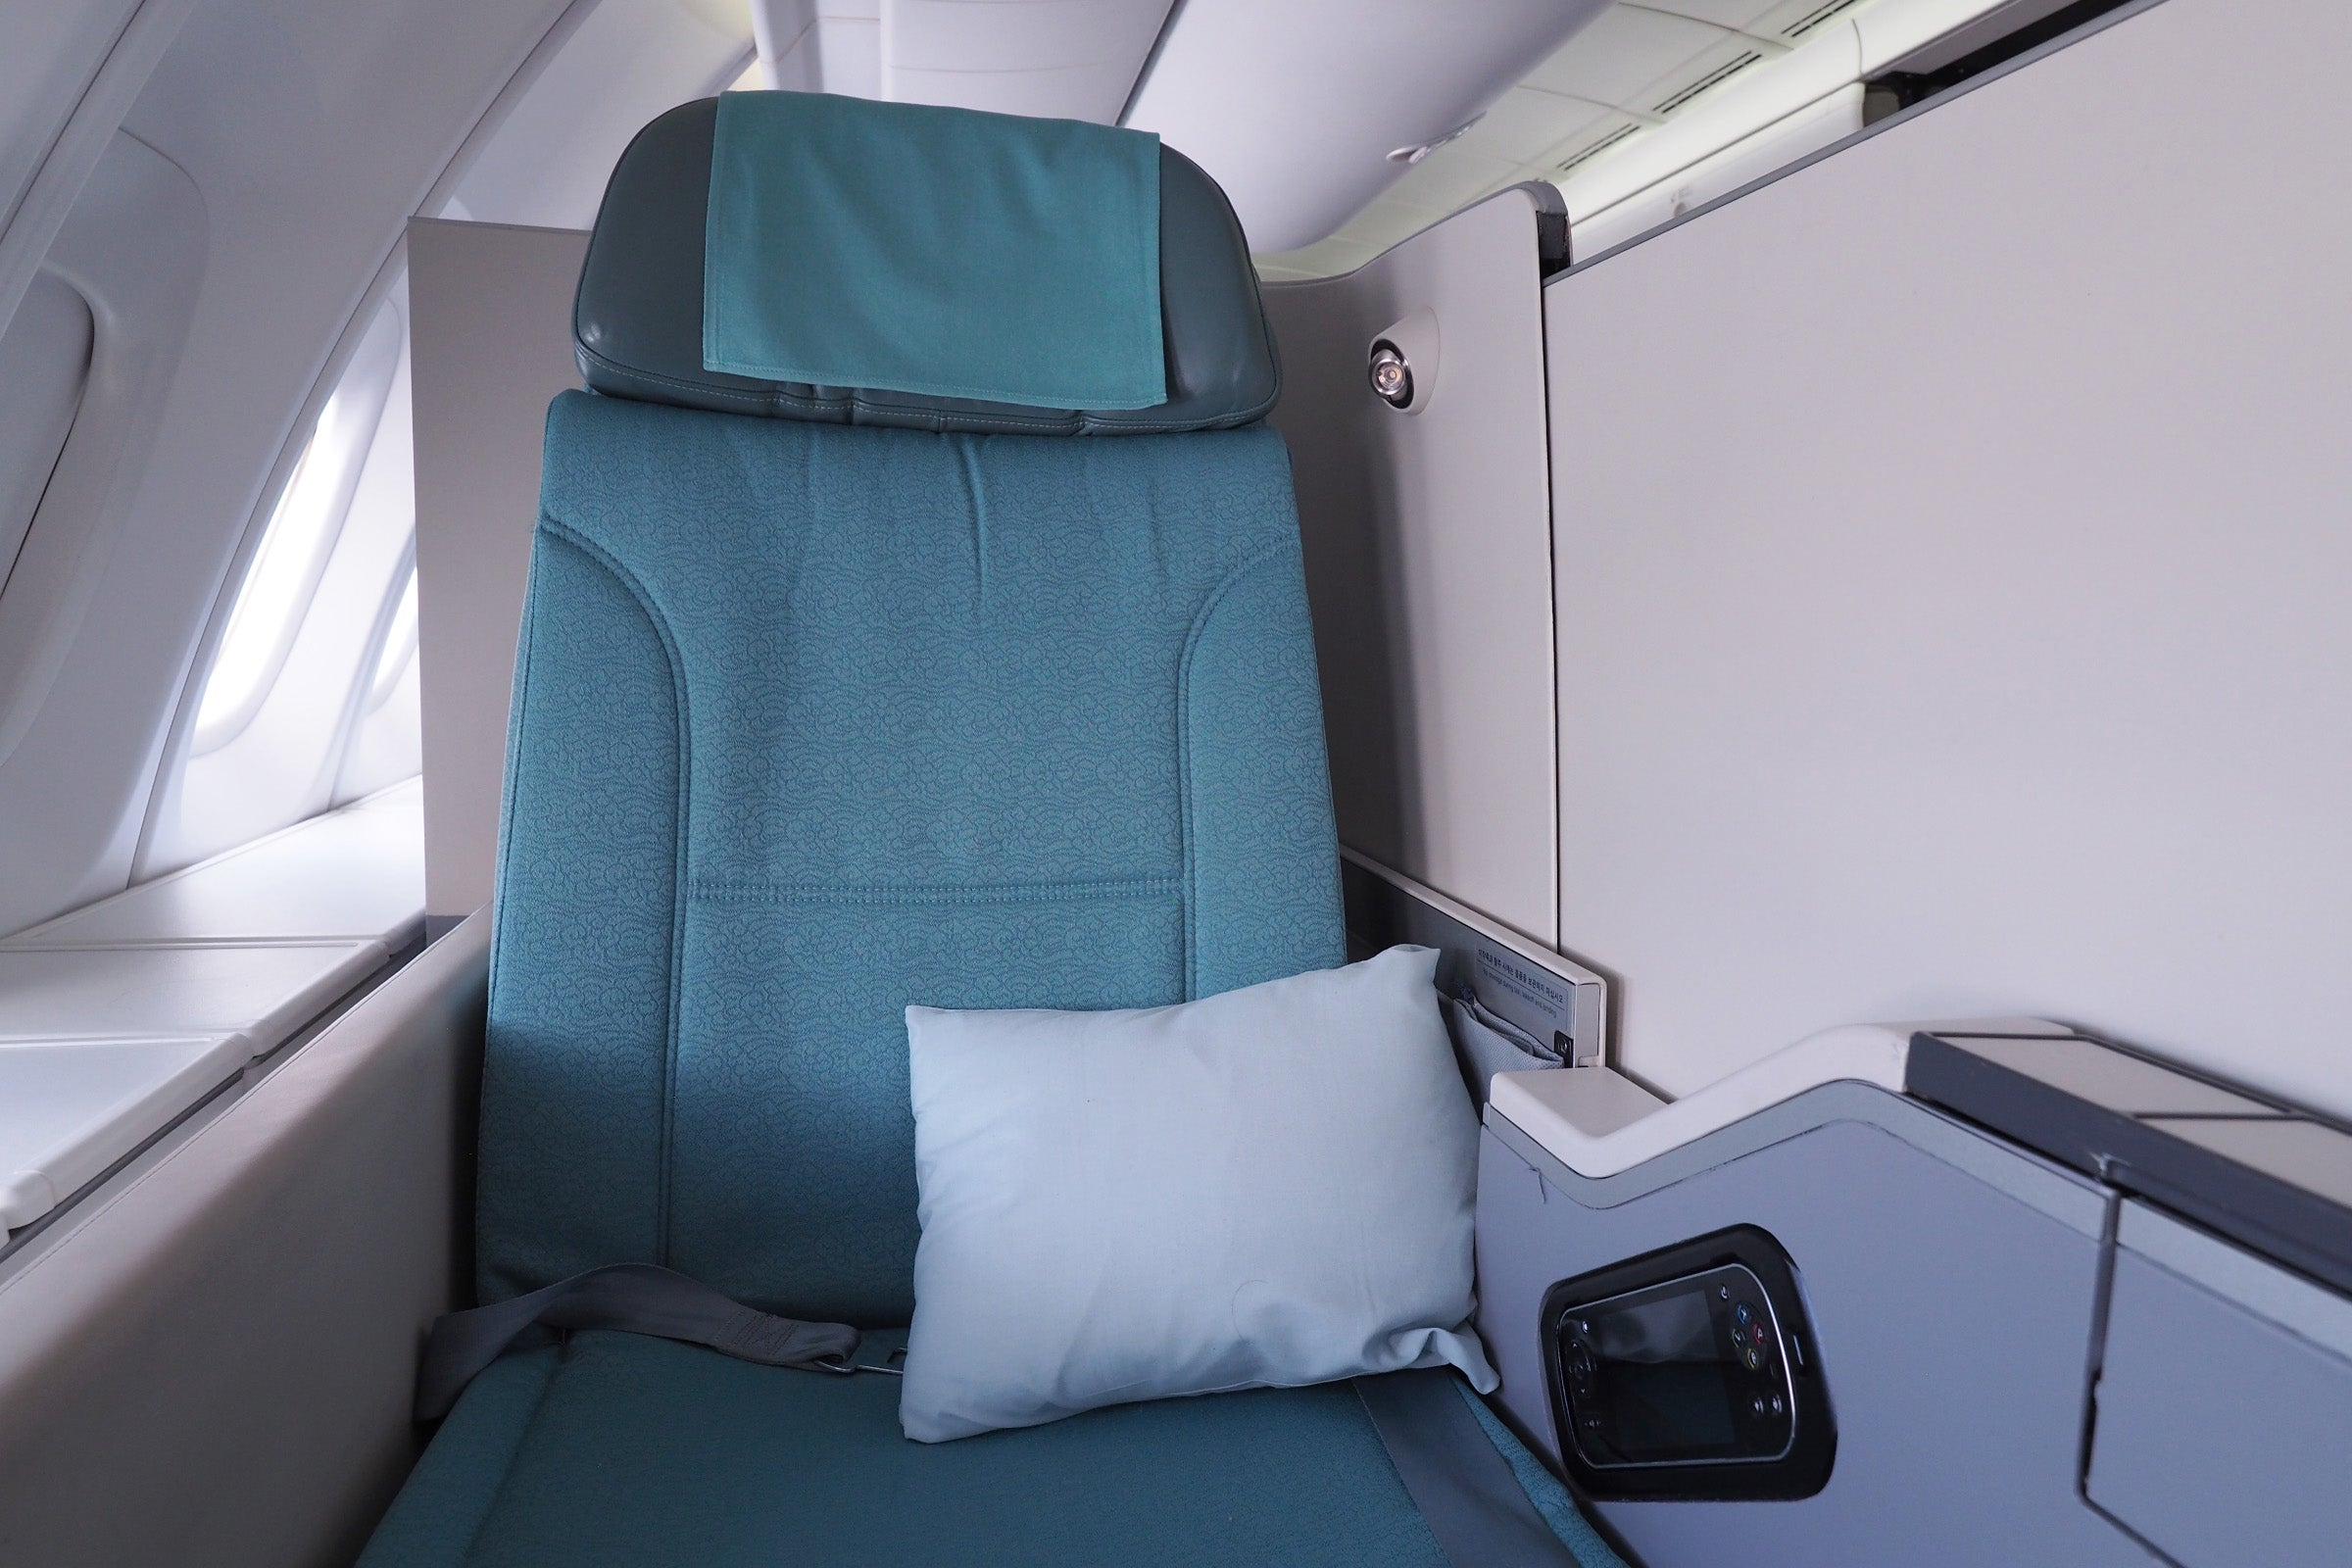 Review: Korean Air (Boeing 747-8) Business Class